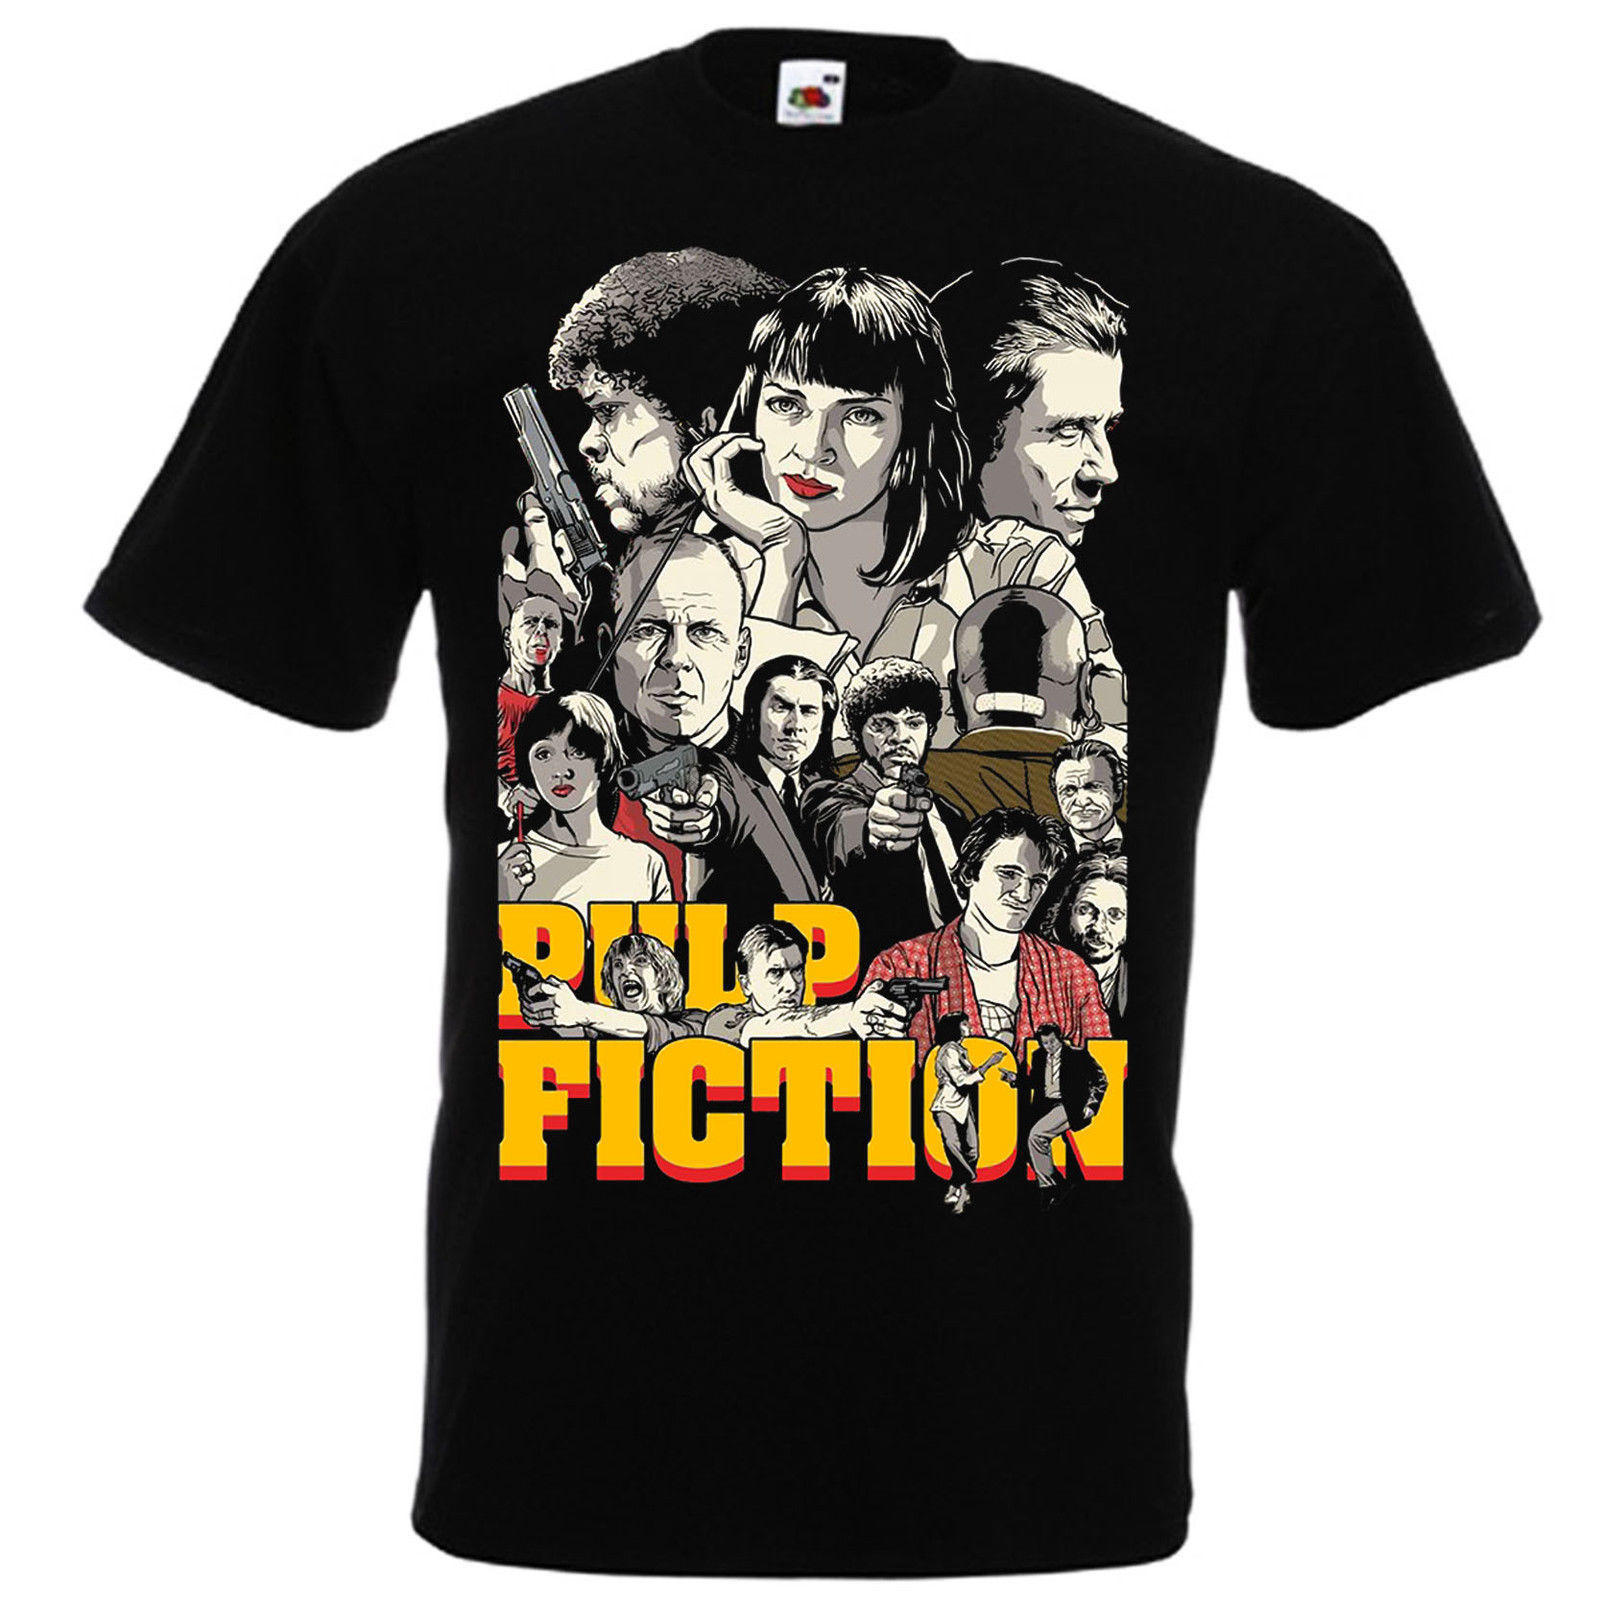 pulp-fiction-black-t-shirt-quentin-font-b-tarantino-b-font-'94-john-travolta-samuel-l-jackson-male-harajuku-top-fitness-brand-clothing